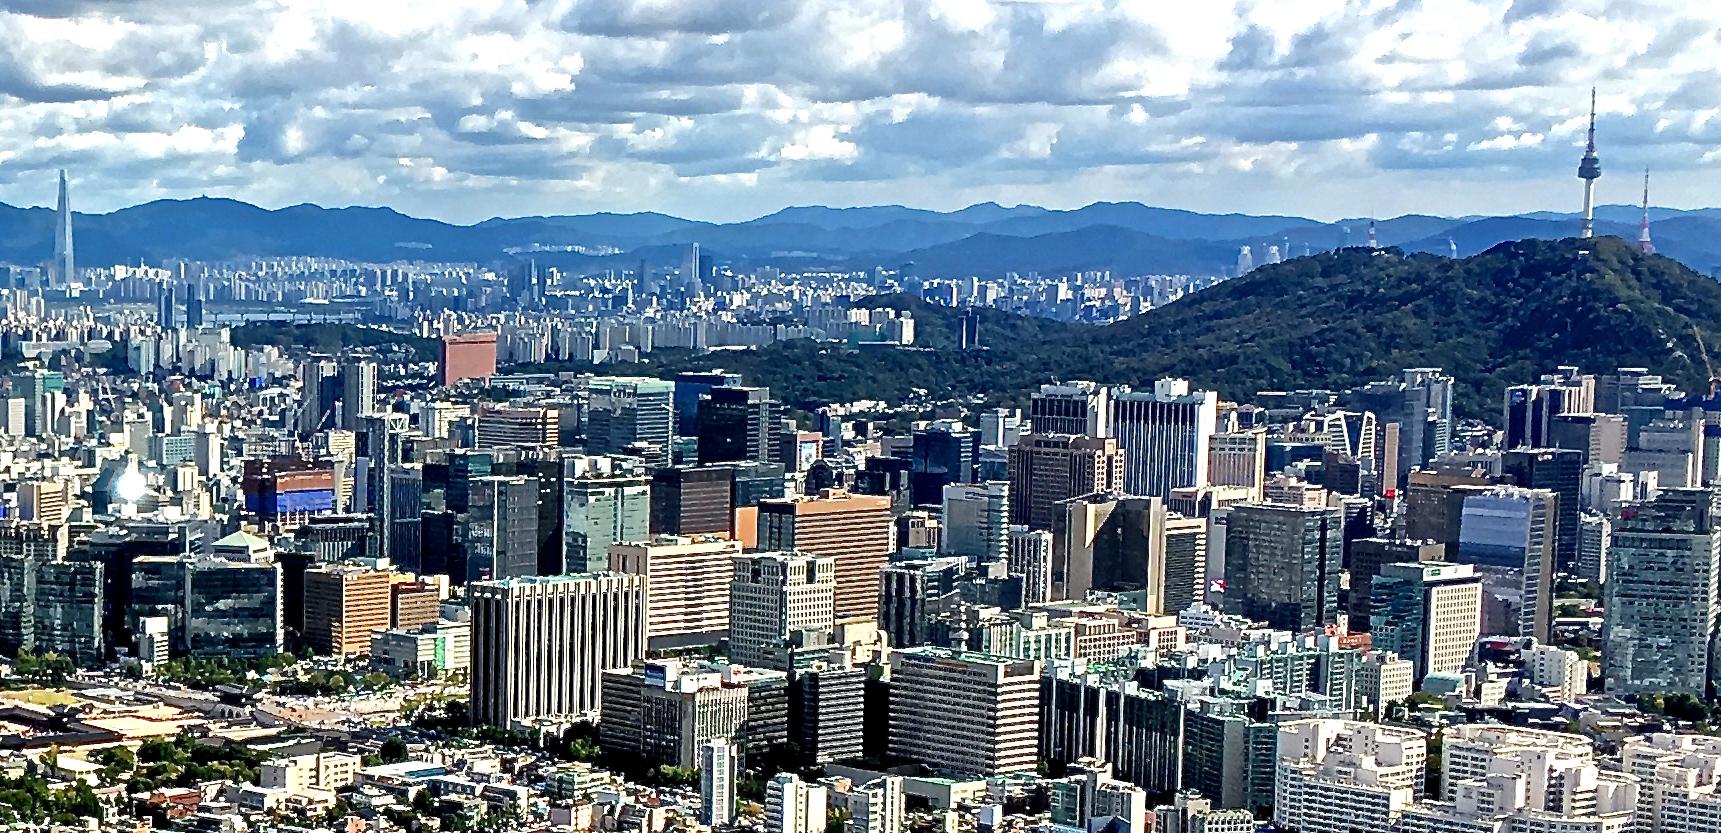 Lotte World Map Pdf. File Lotte World Tower and Namsan in Seoul jpg  Wikimedia